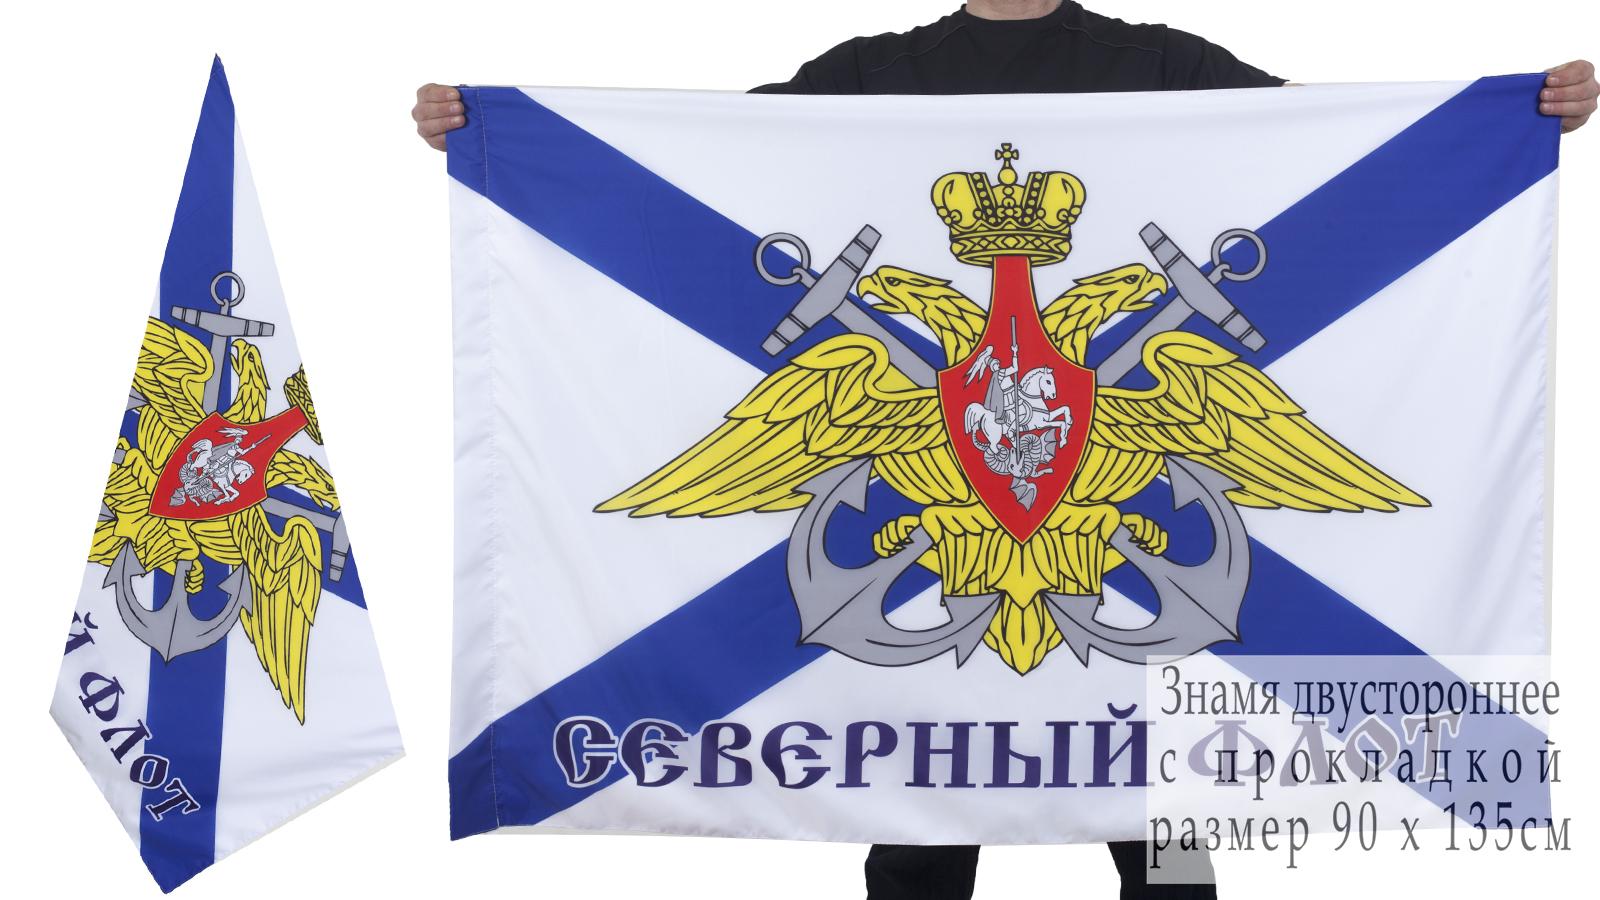 Купить двухсторонний флаг Северного морского флота